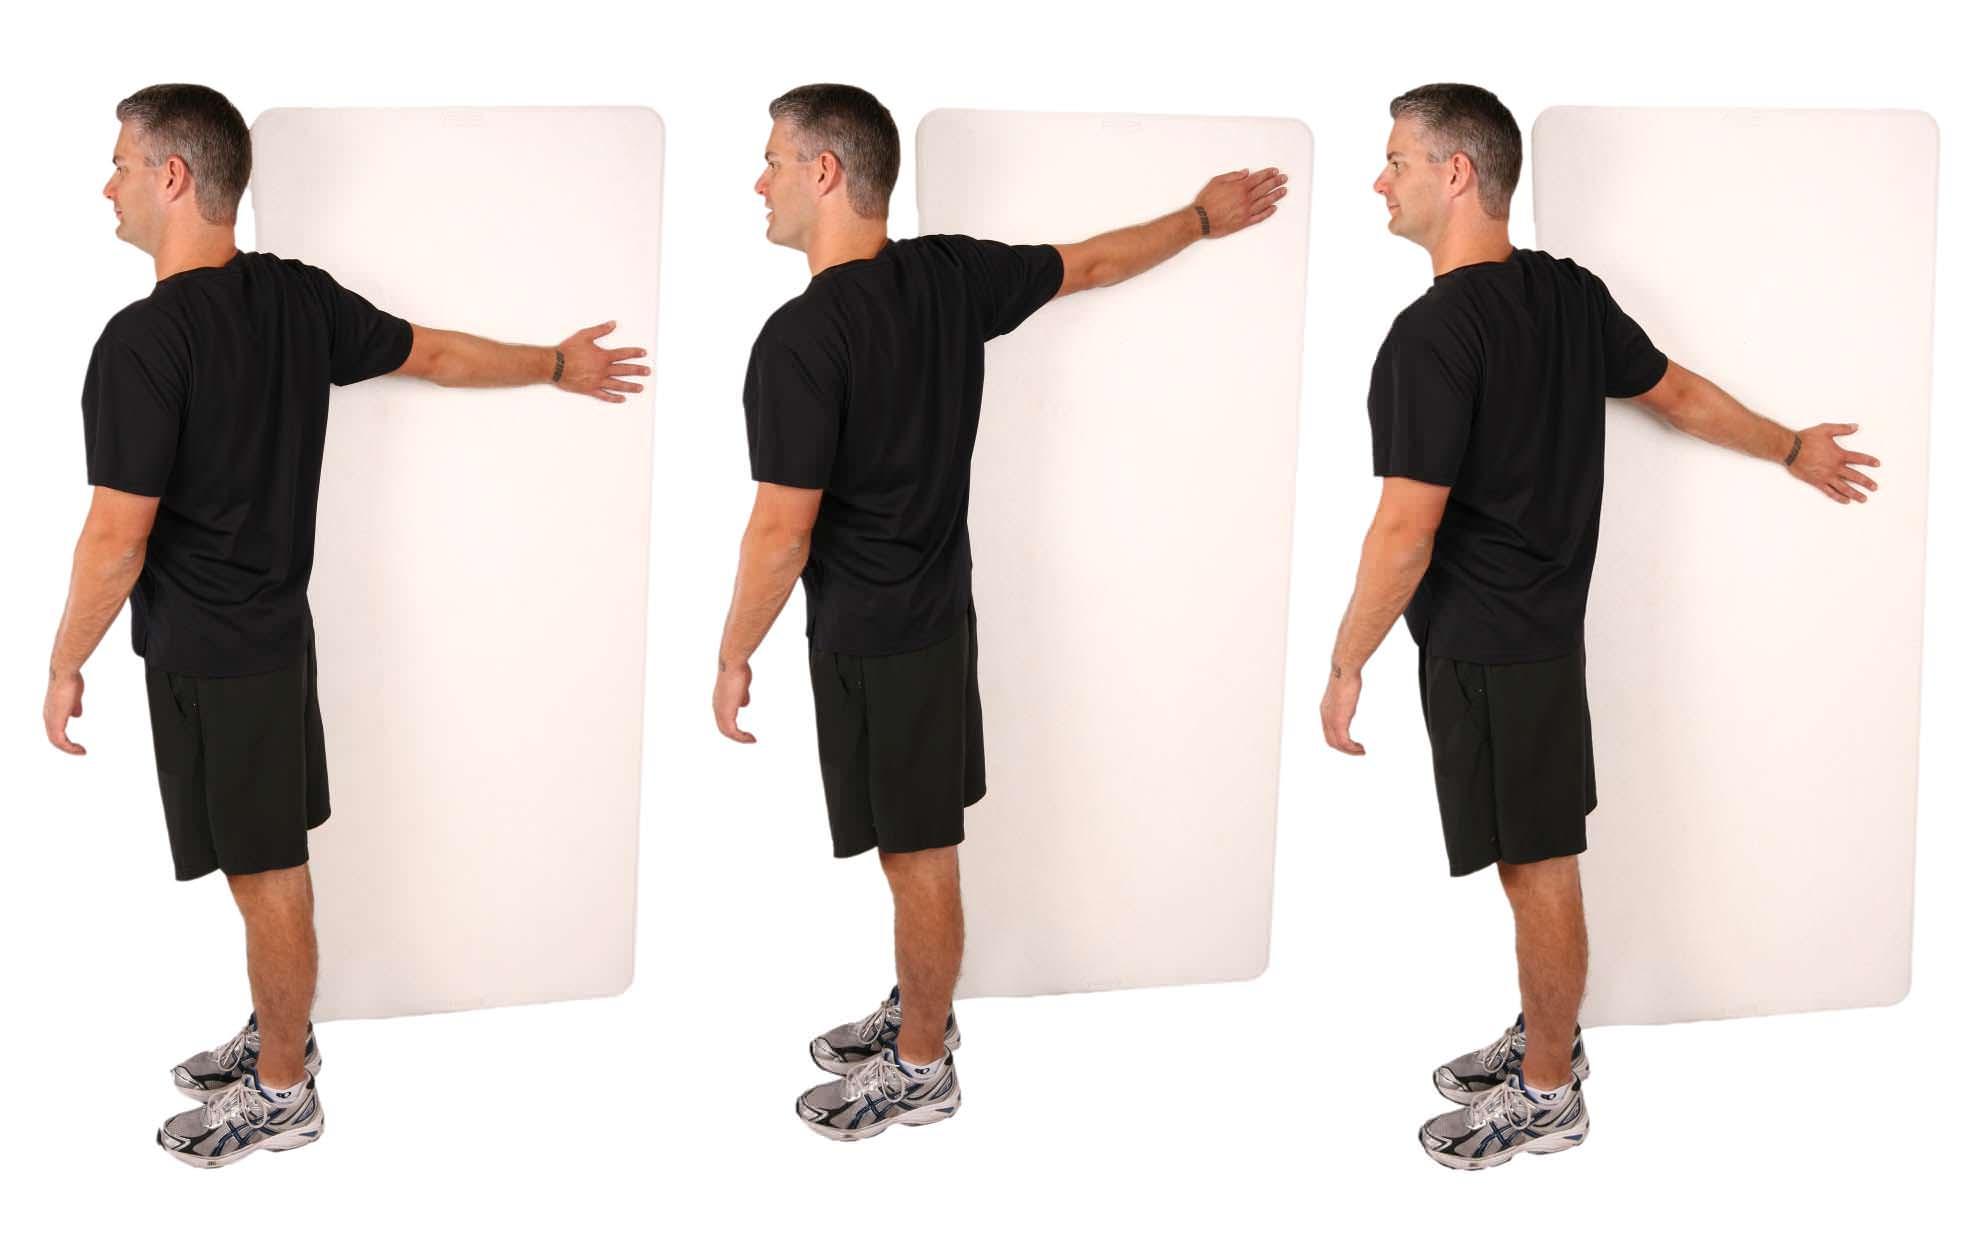 How to Improve Posture: Pectoralis Major Stretch -Toronto Chiropractor